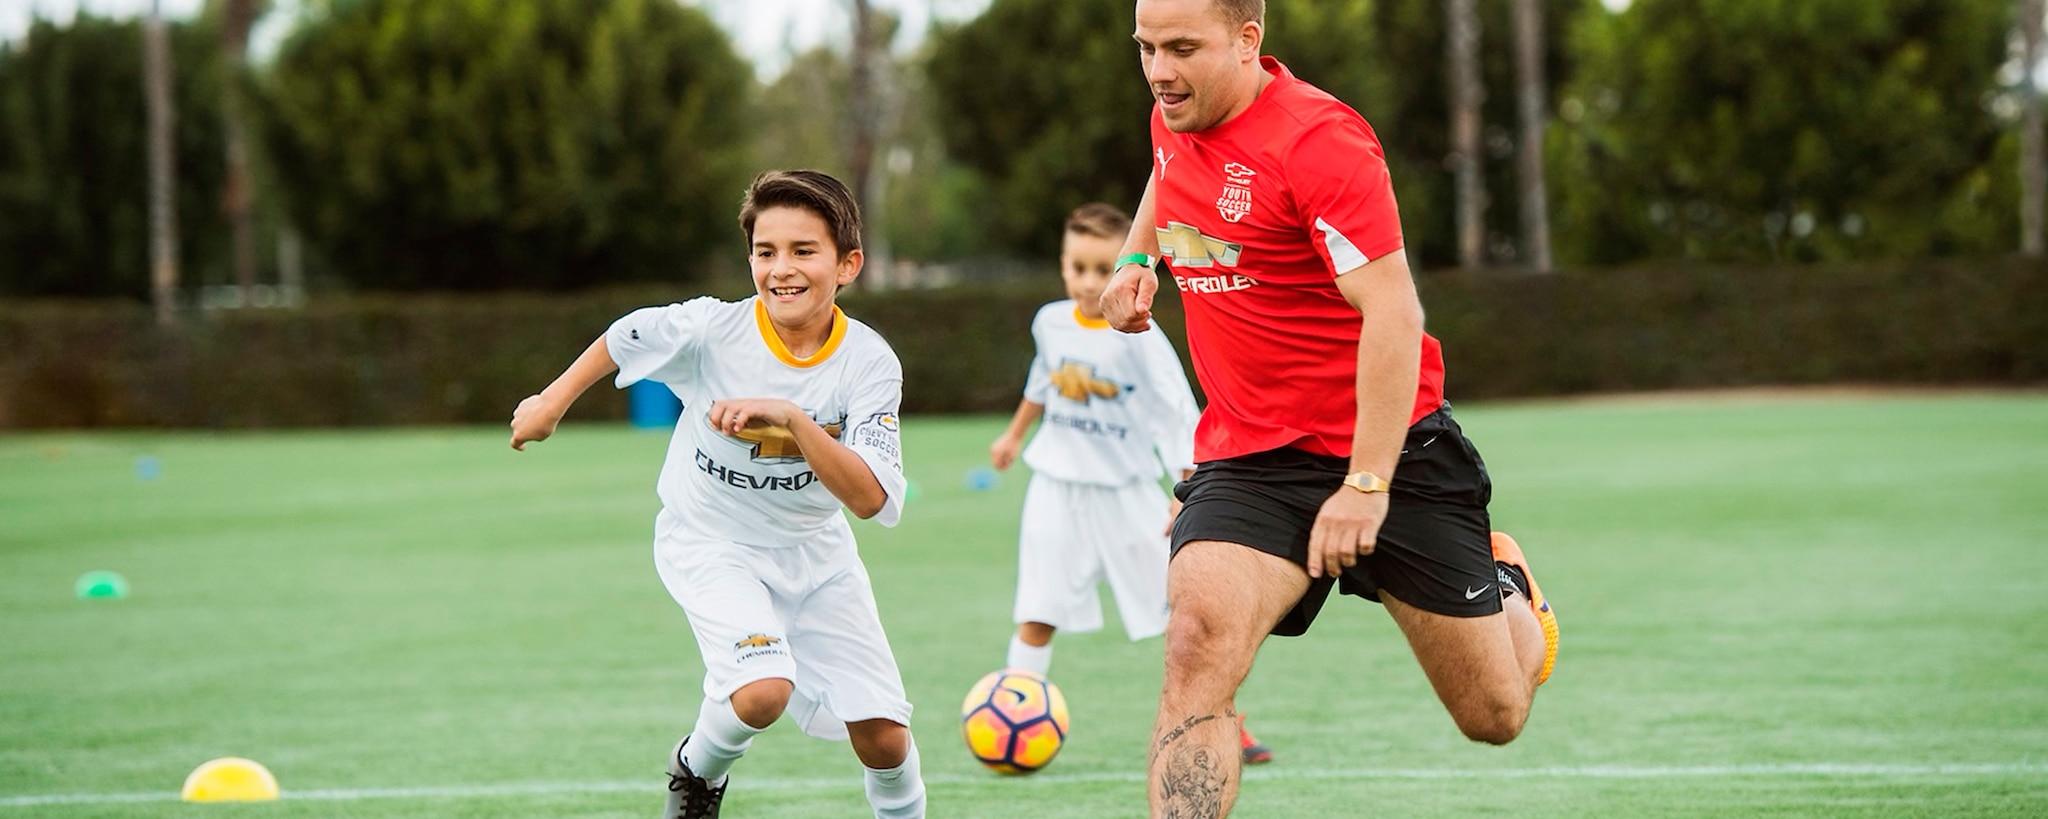 Deportes juveniles Chevy, fútbol